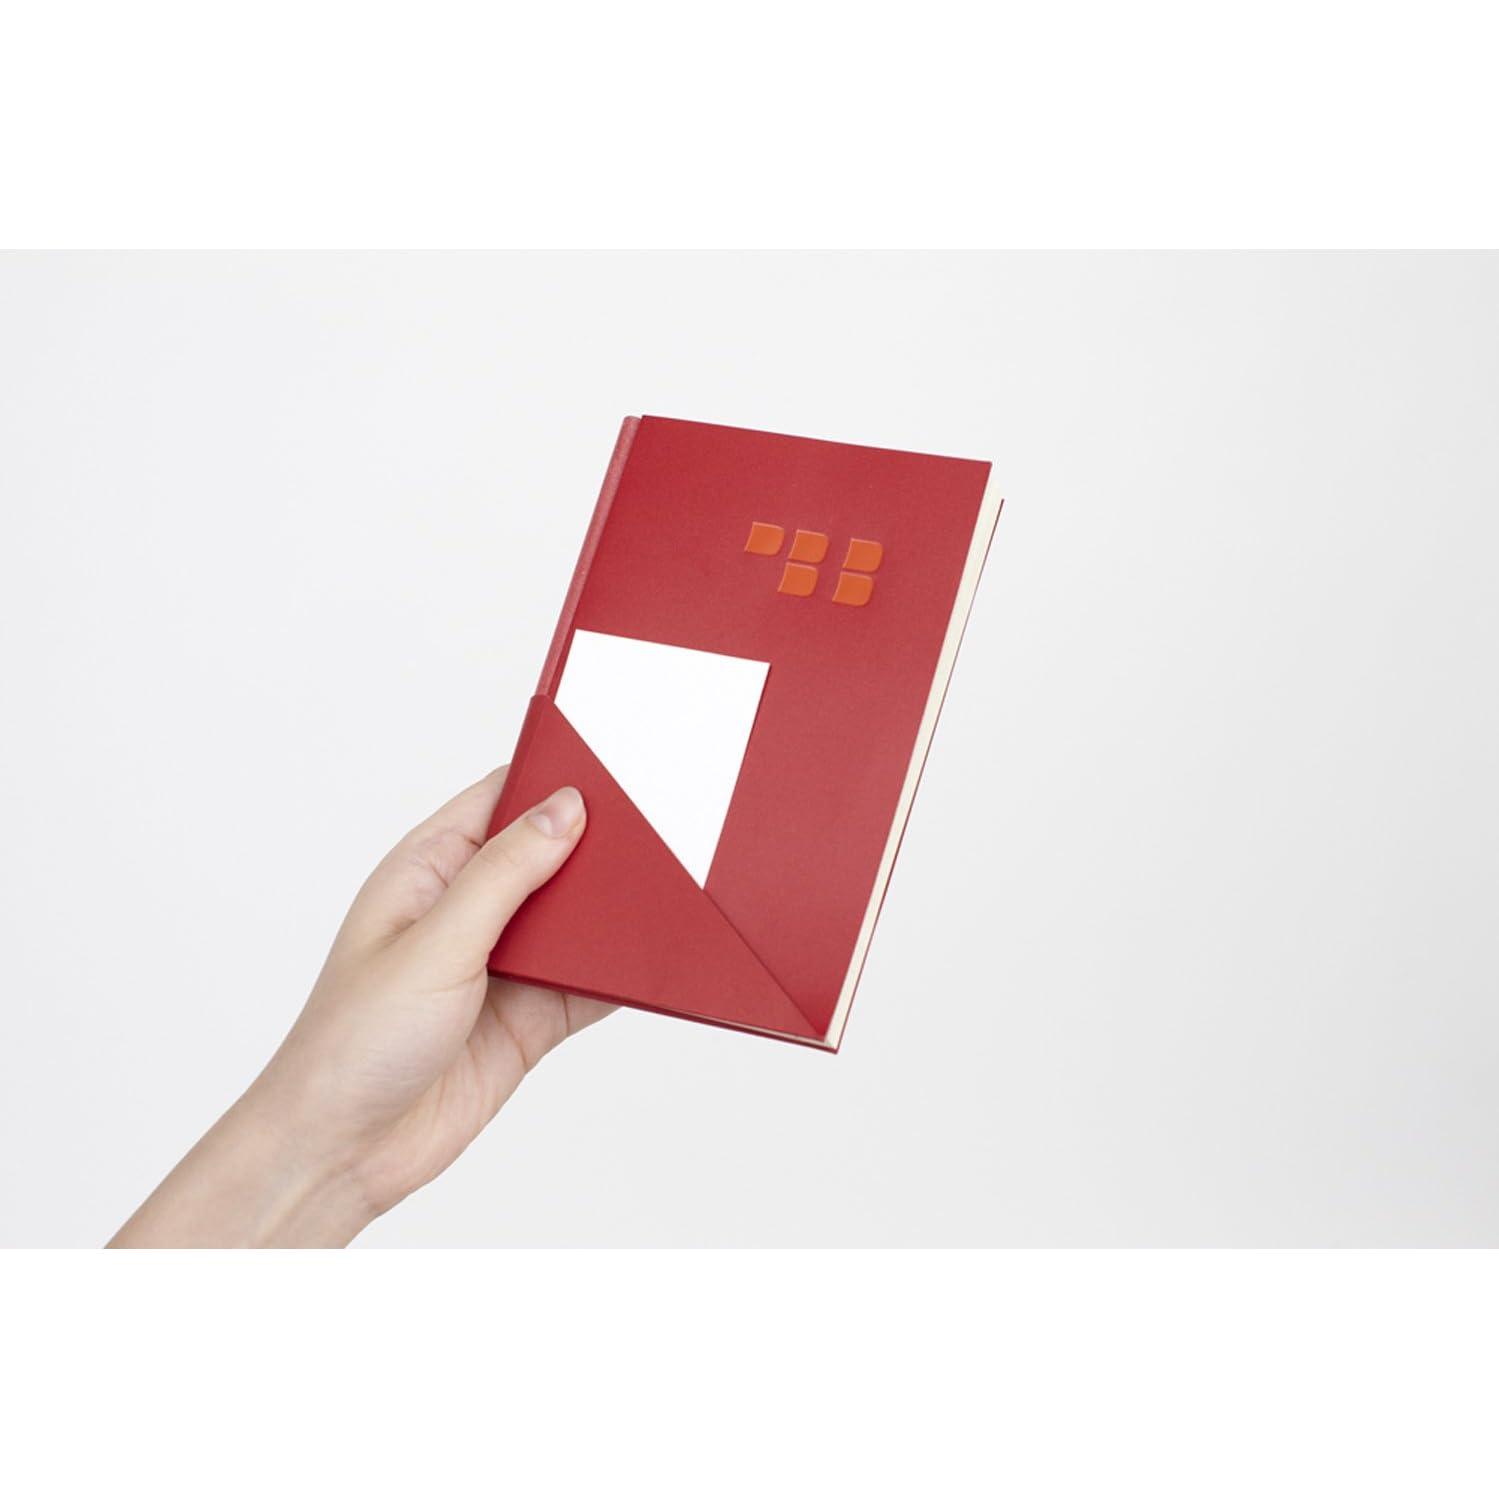 Amazon.co.jp: D-BROS FOR BUSINESS ペン アンド ノート (レッド): ホーム&キッチン